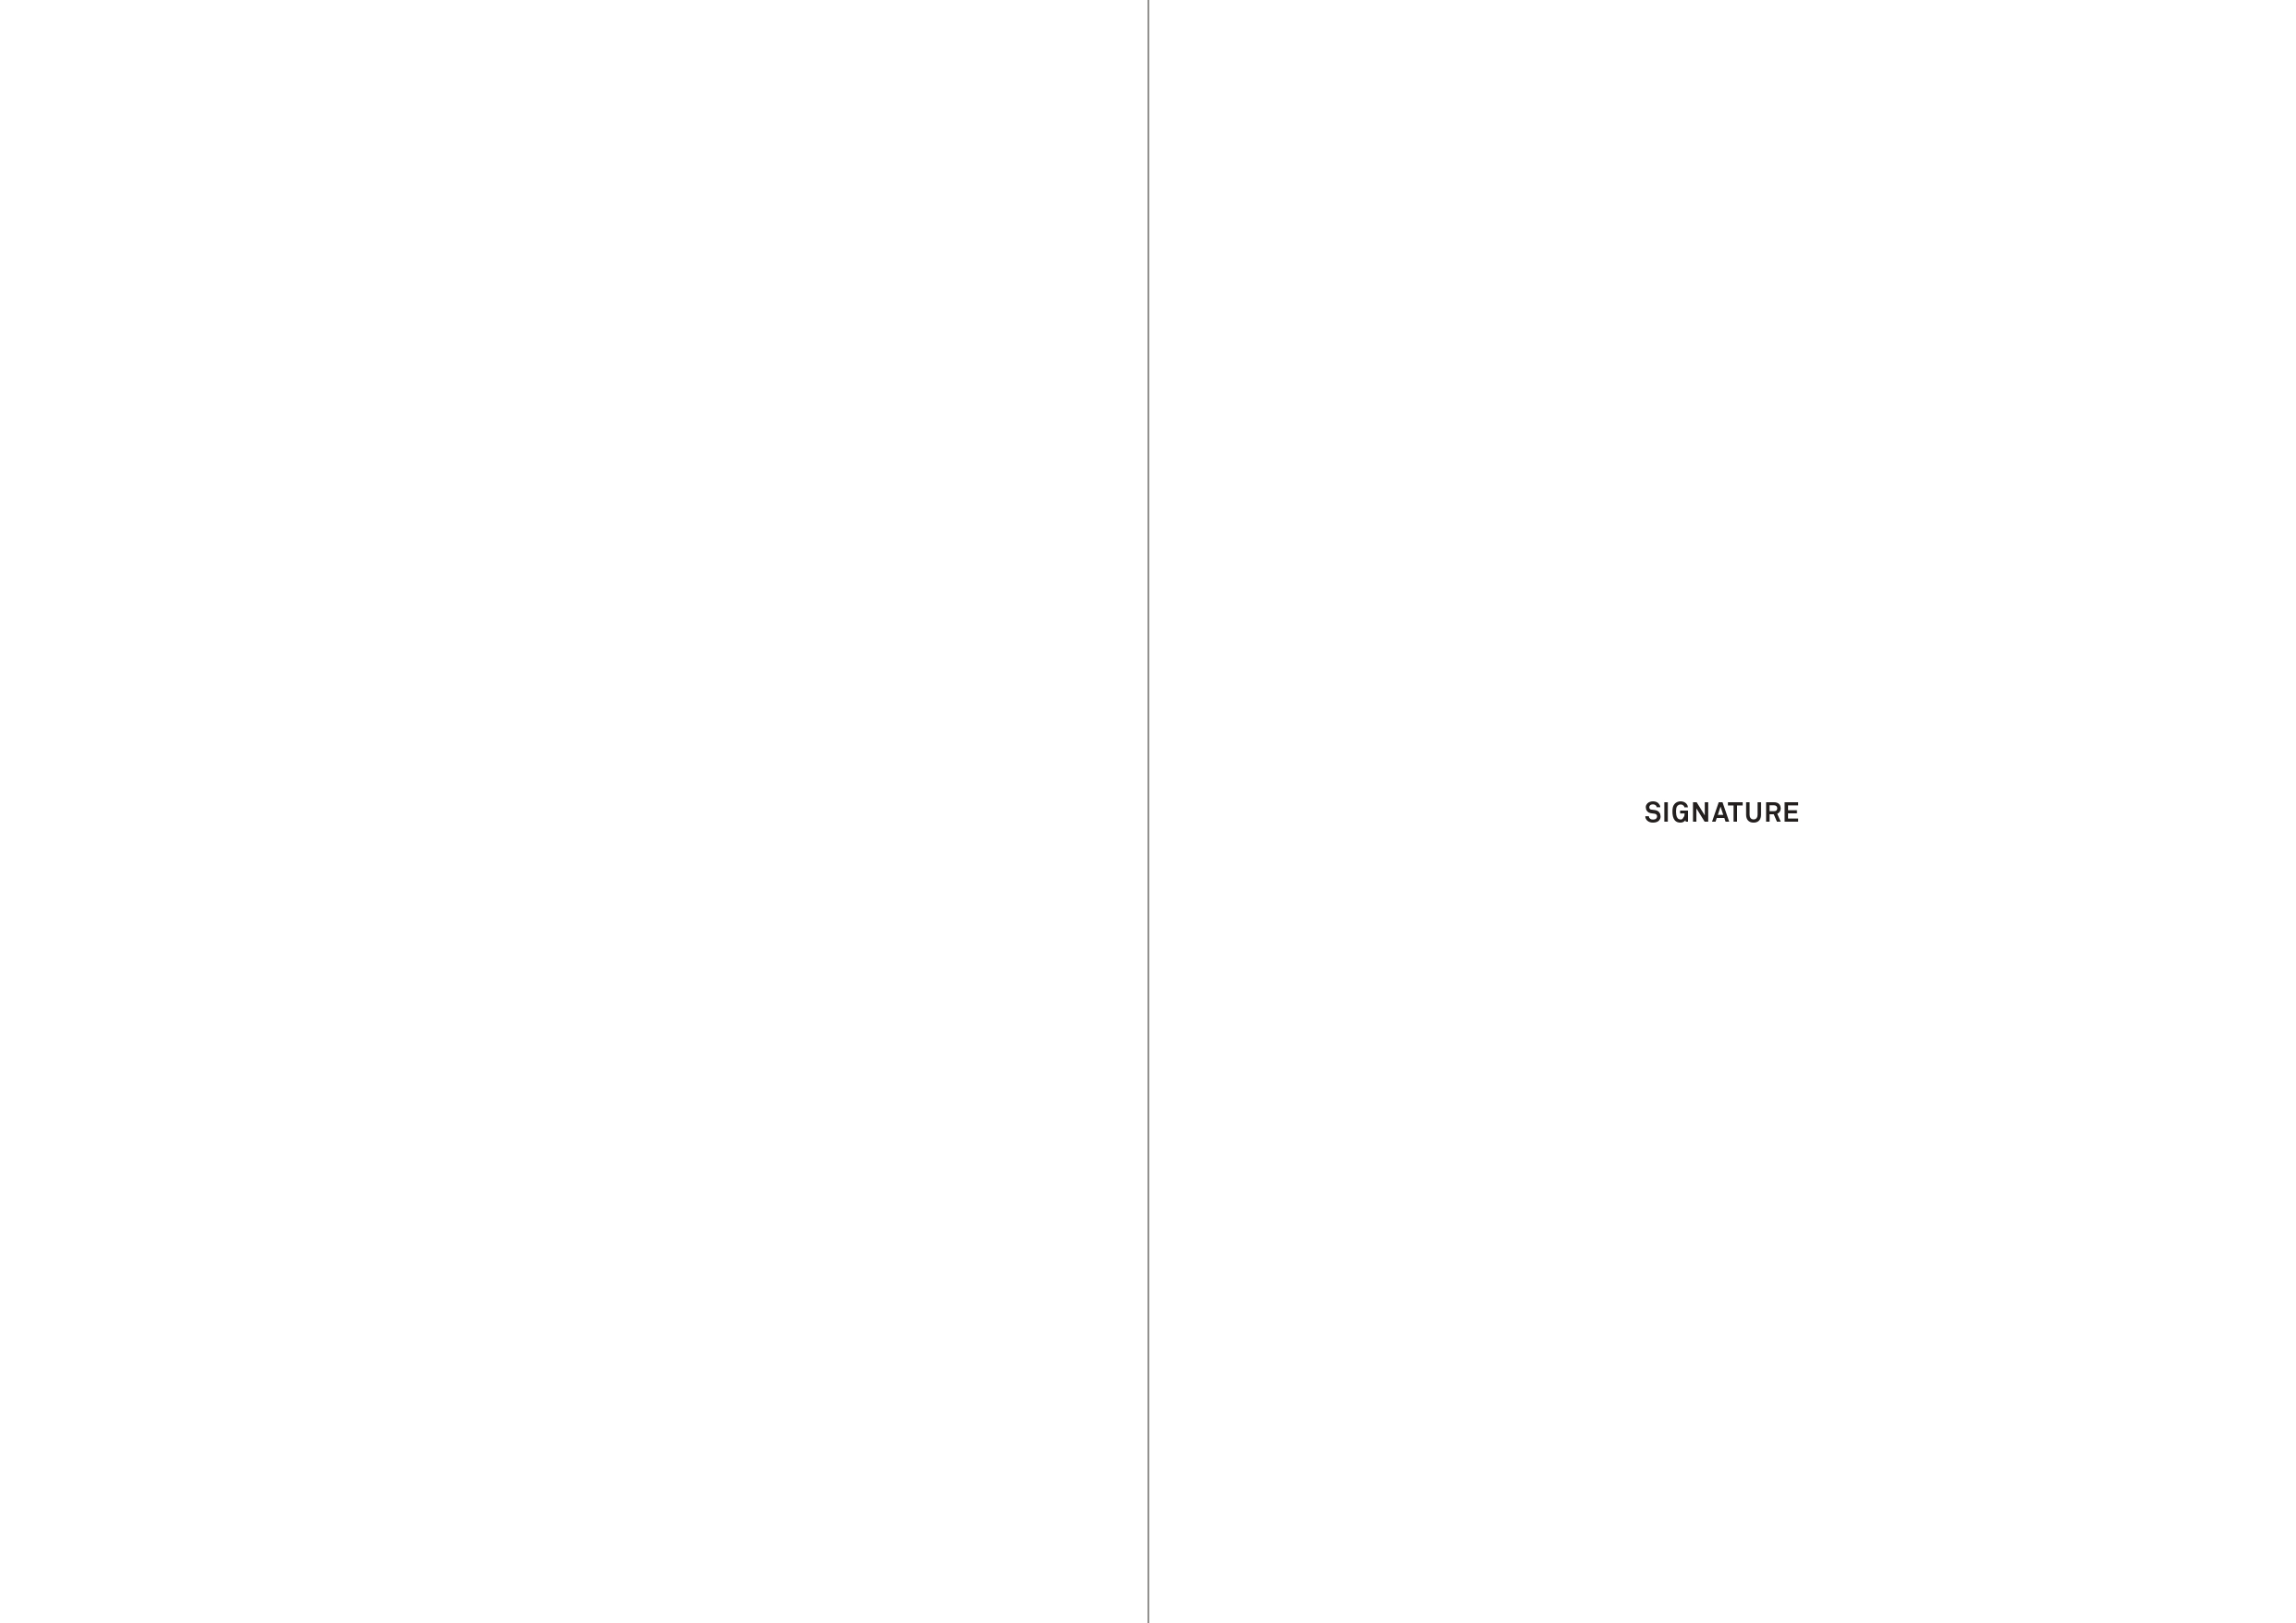 Frama l 2019 l general catalogue_page-0062.jpg